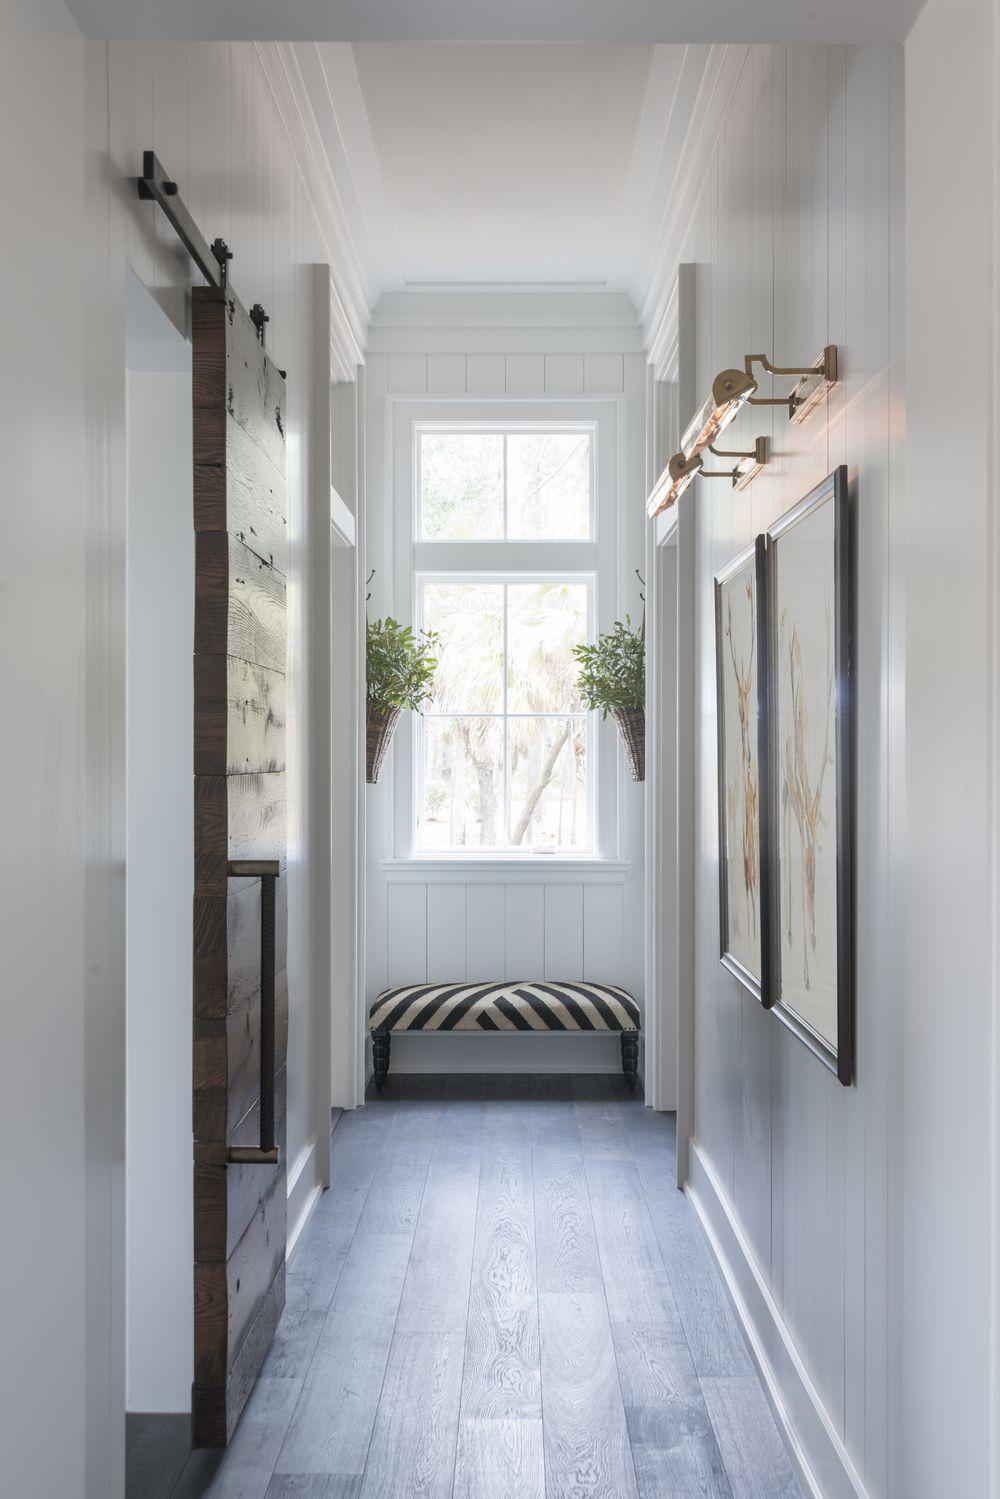 Cameron4cameron 036 Jpg Hallway Decorating Hallway Designs Upstairs Hallway